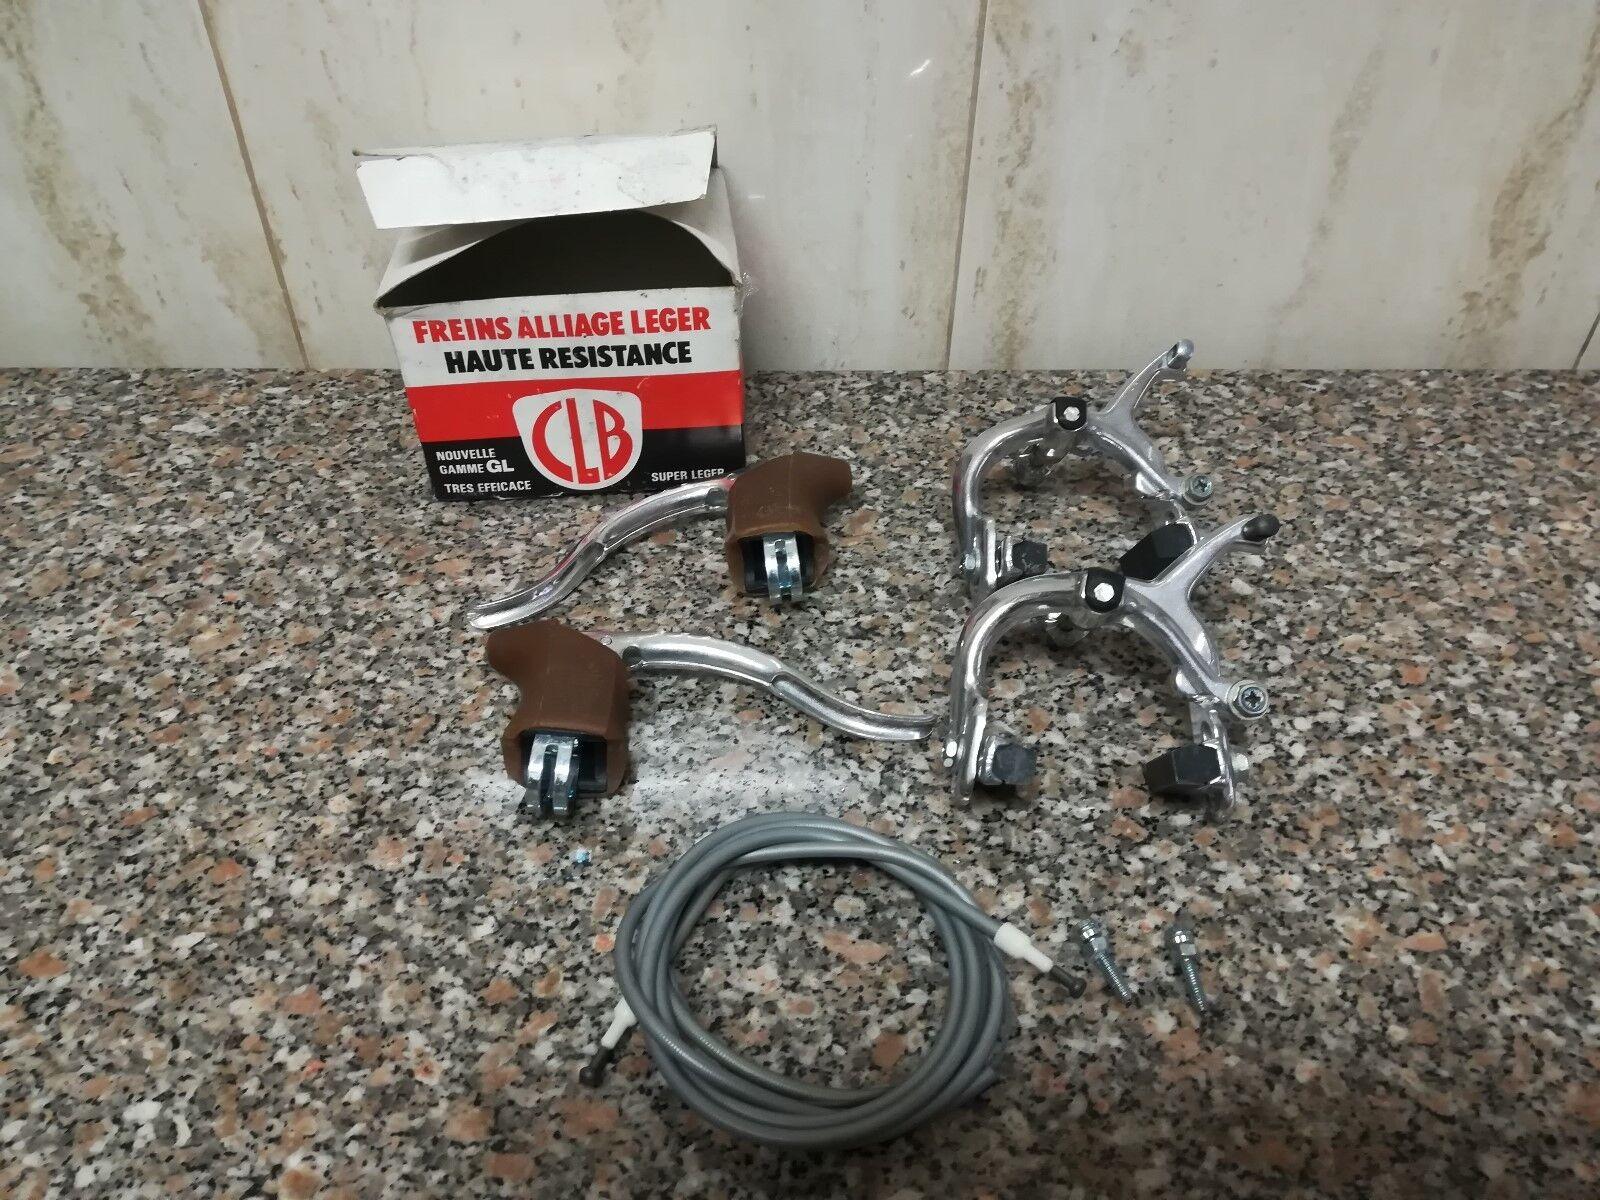 CLB freno de bicicleta de carretera vintage, modele Sulky Competition 48-65